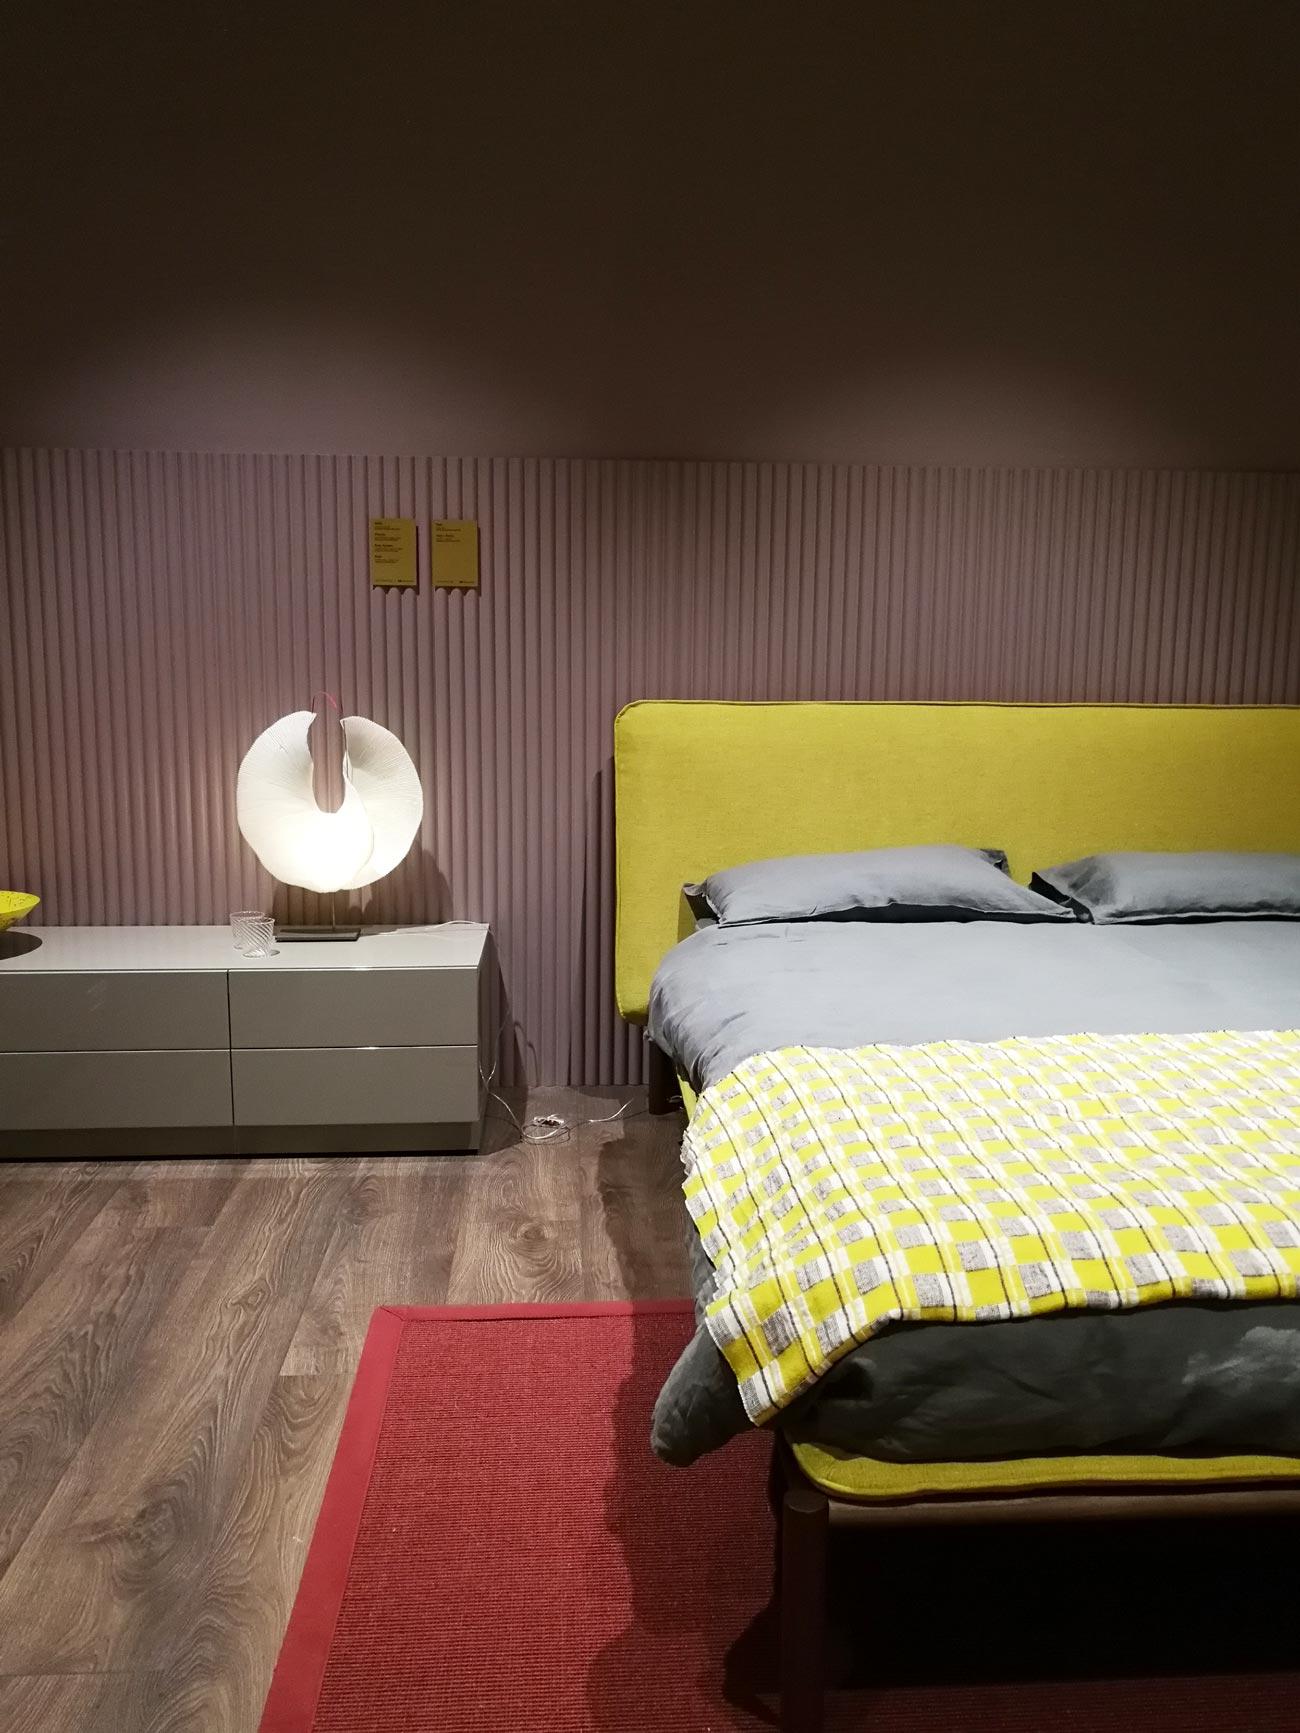 Interior-Design-Tips_5-Star-Hotel-Bedroom_authentic-interior-2-min